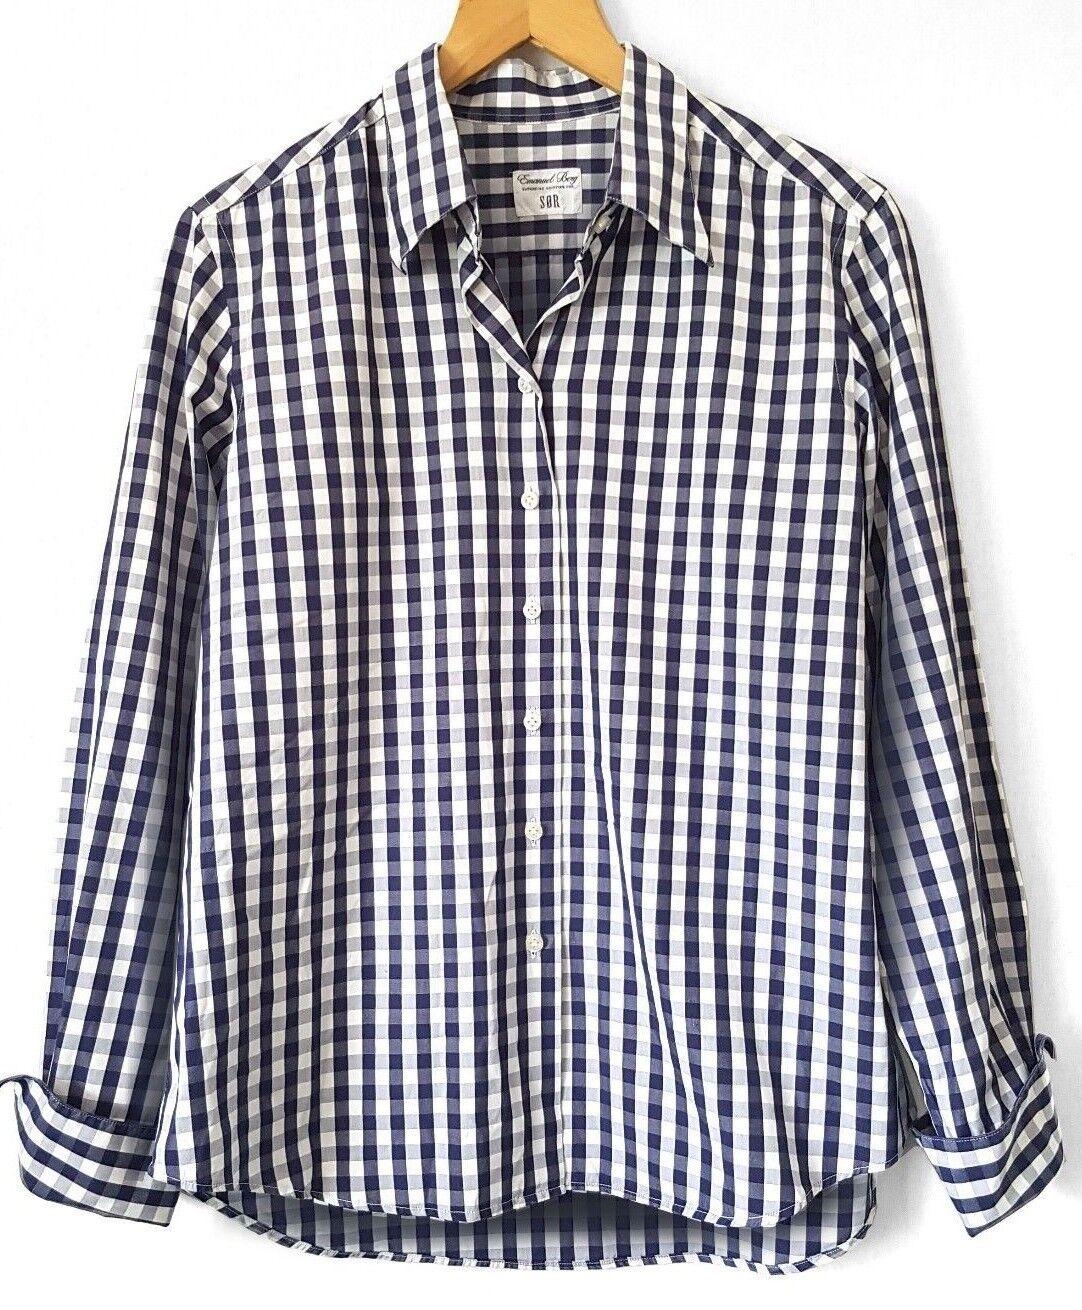 Emanuel BERG CAMICIA Manica Lunga Top Camicia Donna Blusa Camicia Camicetta S 38 40 BLU k19